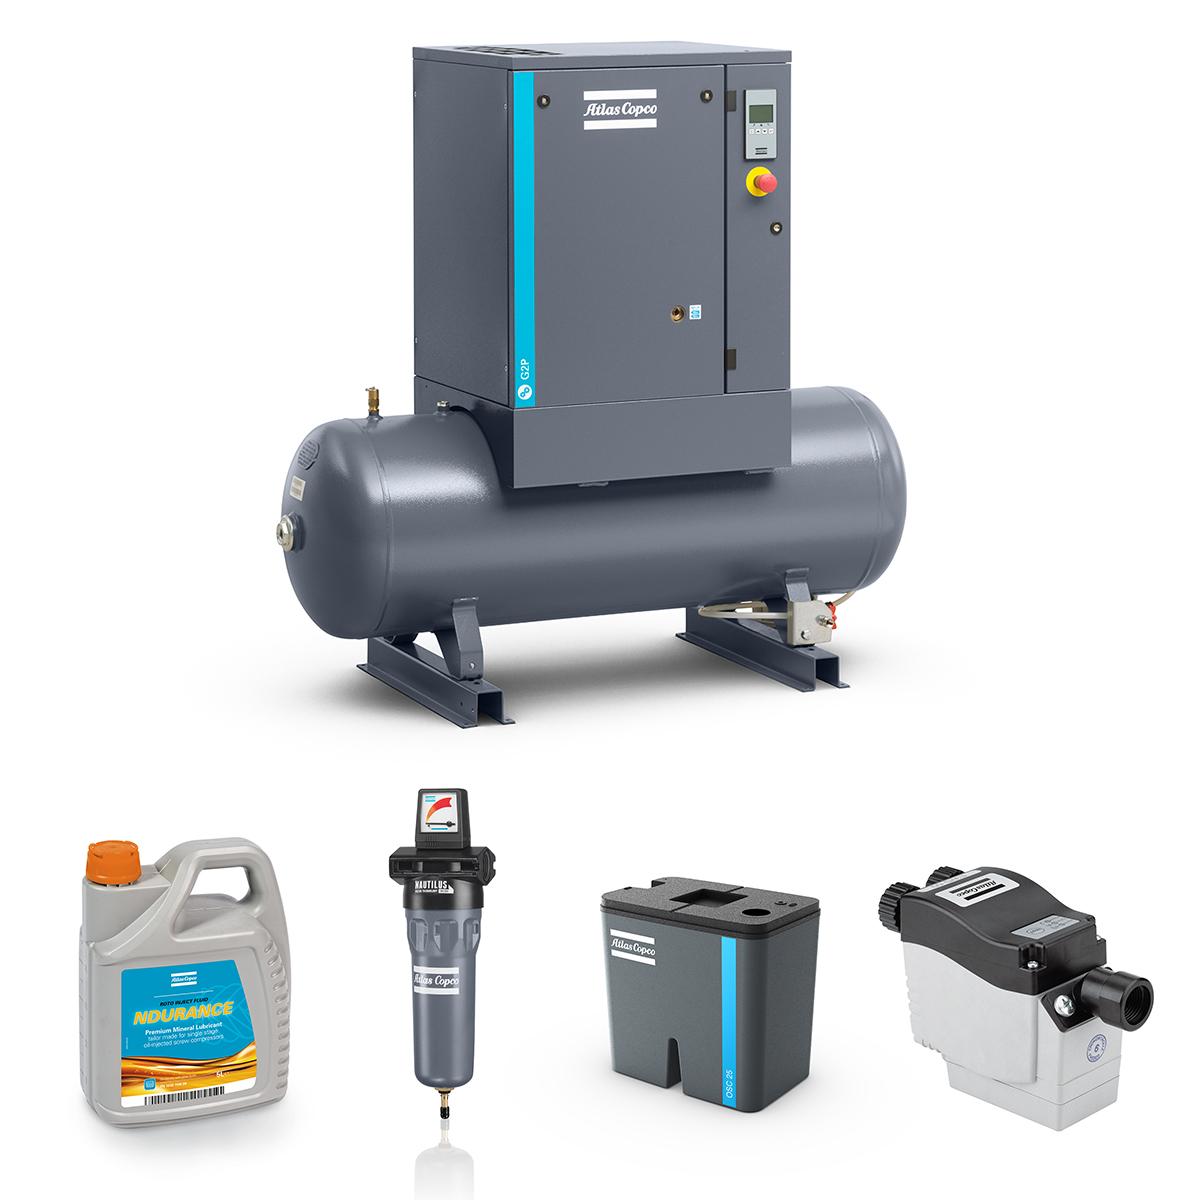 2.2kW Screw Compressed Air Bundle: Compressor, Separator, Filter, Drain, Oil